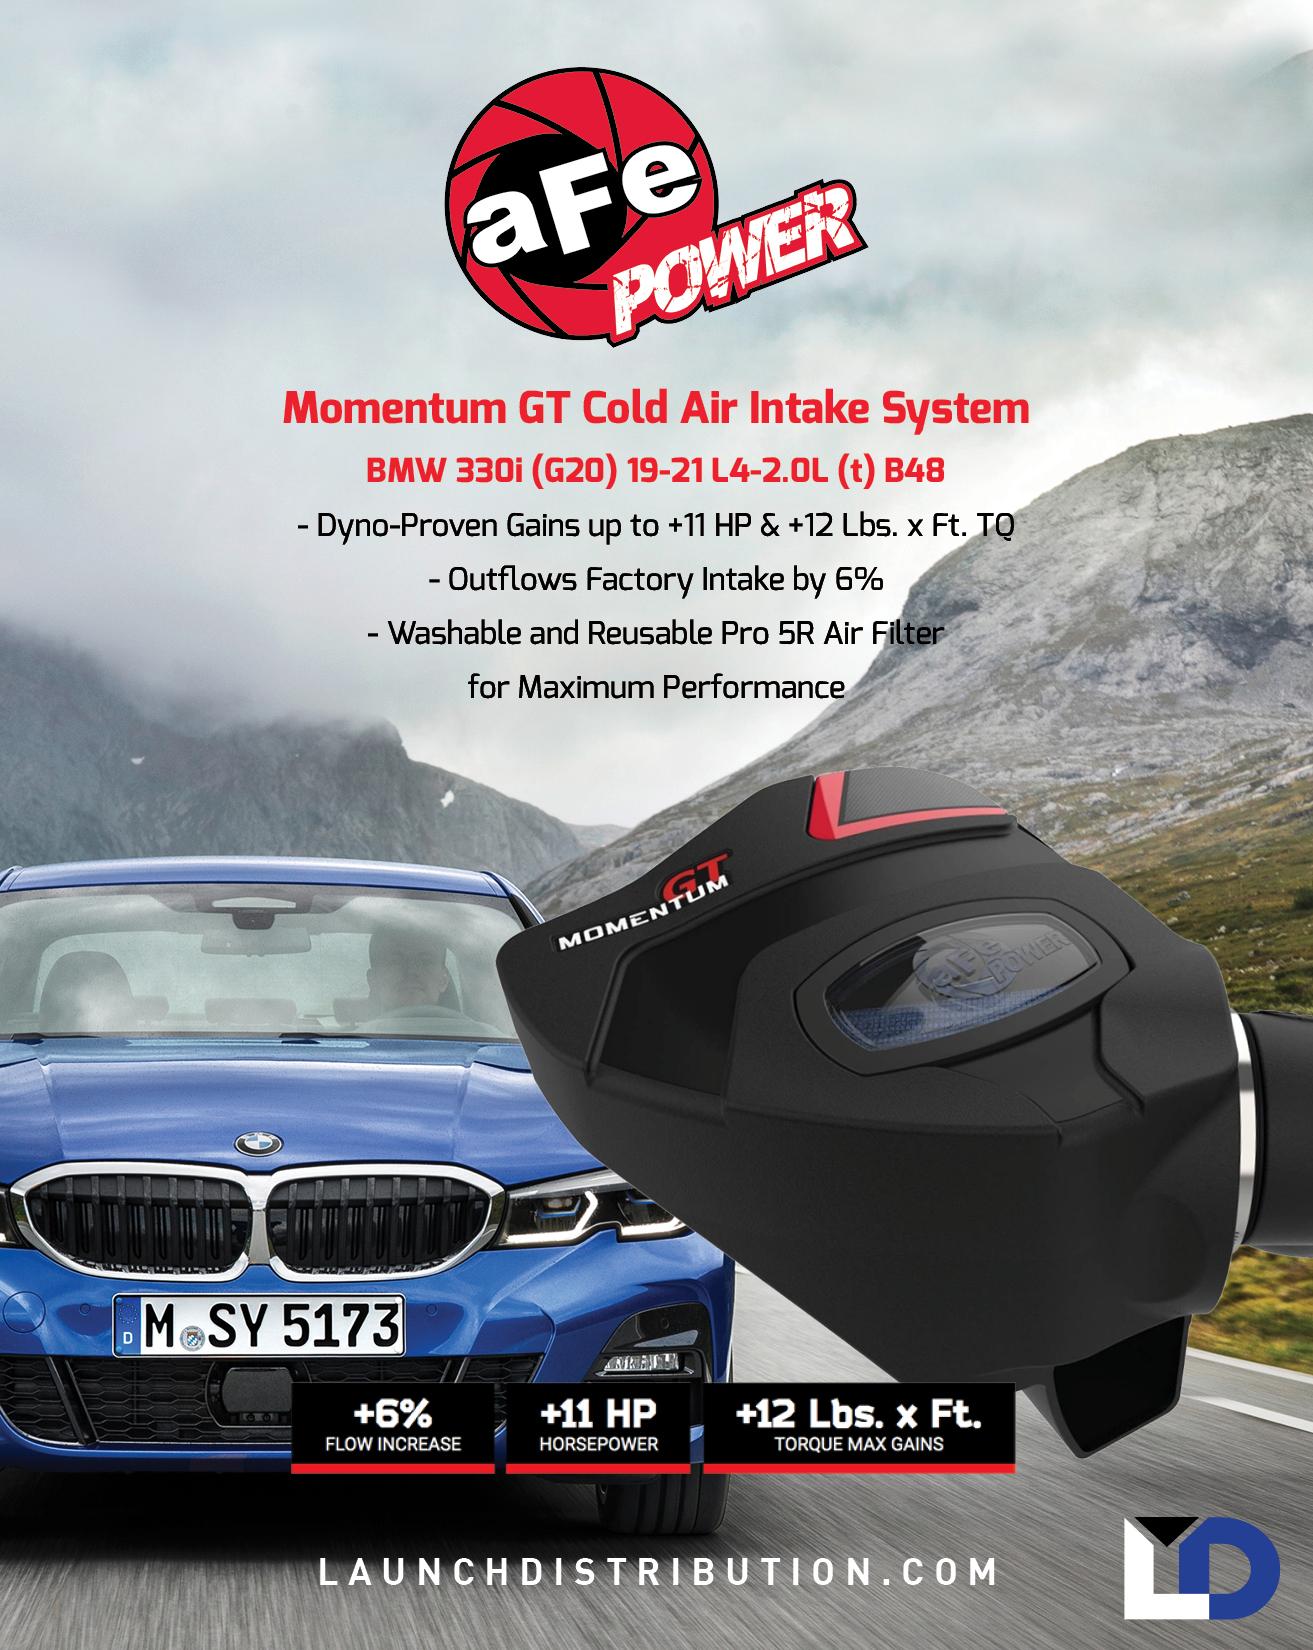 aFe Power Momentum GT CAI for BMW 330i (G20)